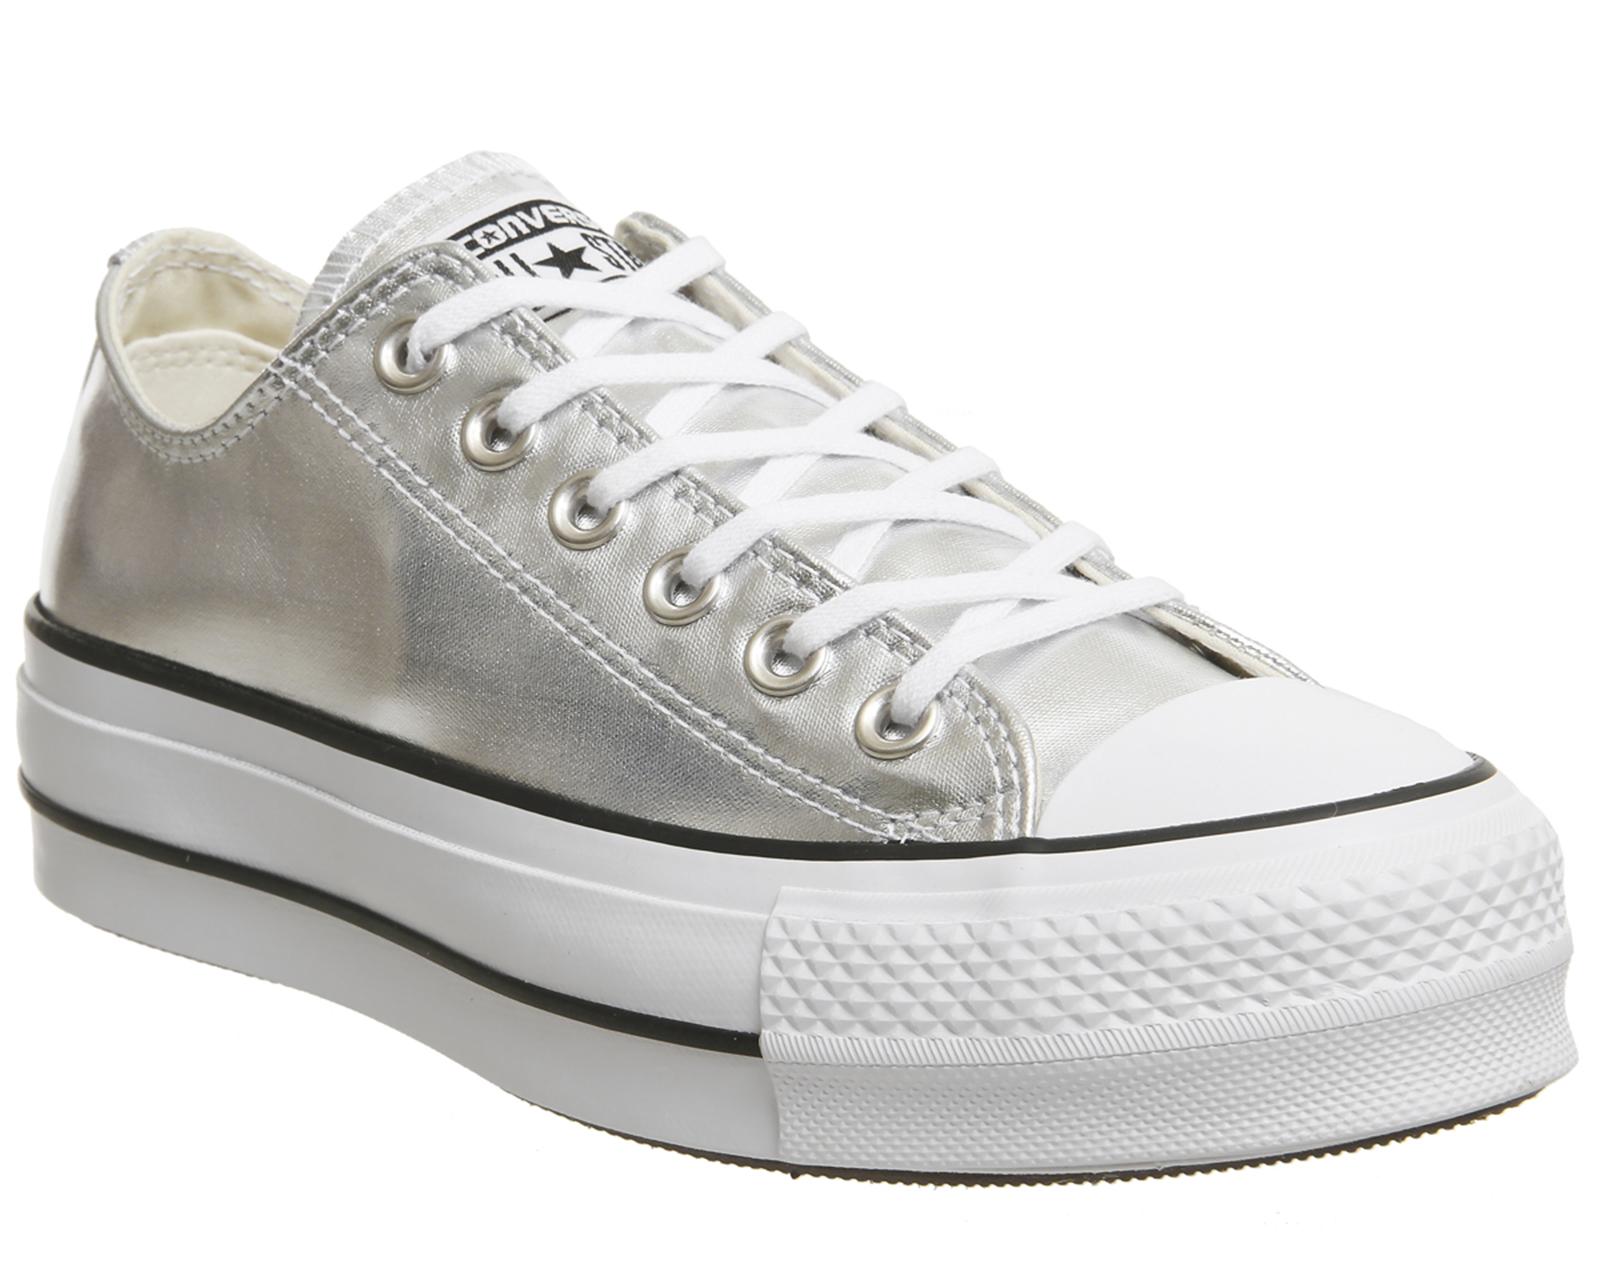 adbb70e062cf Sentinel Womens Converse All Star Low Platforms Silver Black White Trainers  Shoes